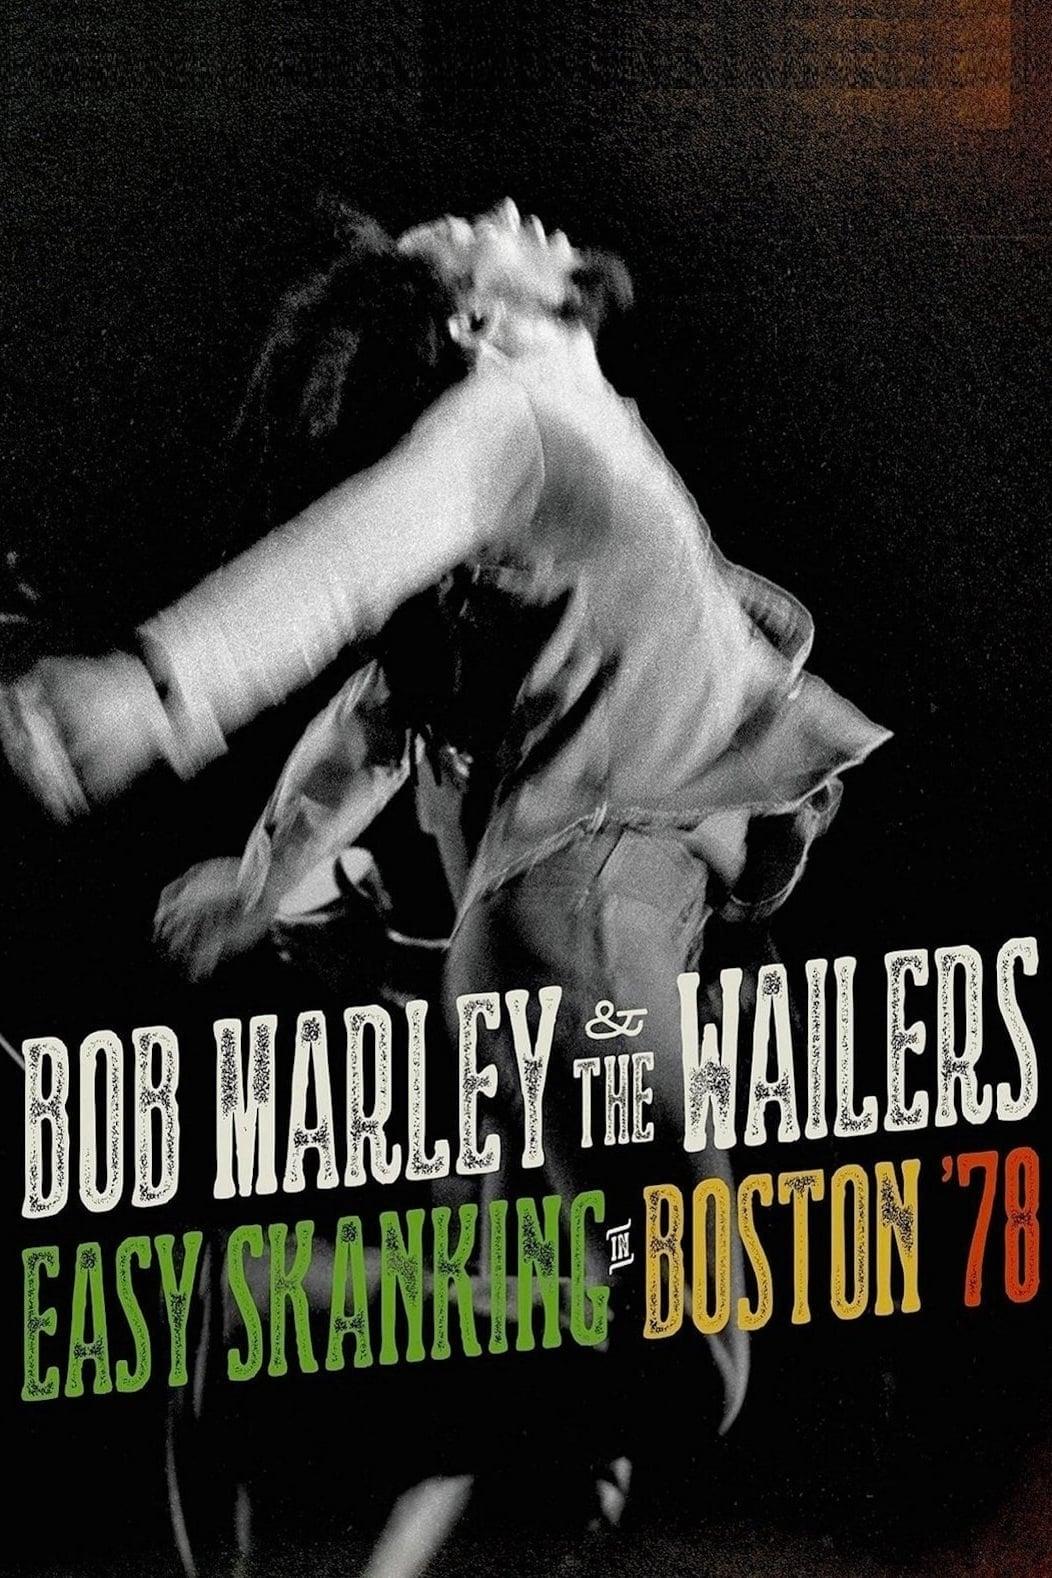 Bob Marley & The Wailers: Easy Skanking in Boston '78 (2015)